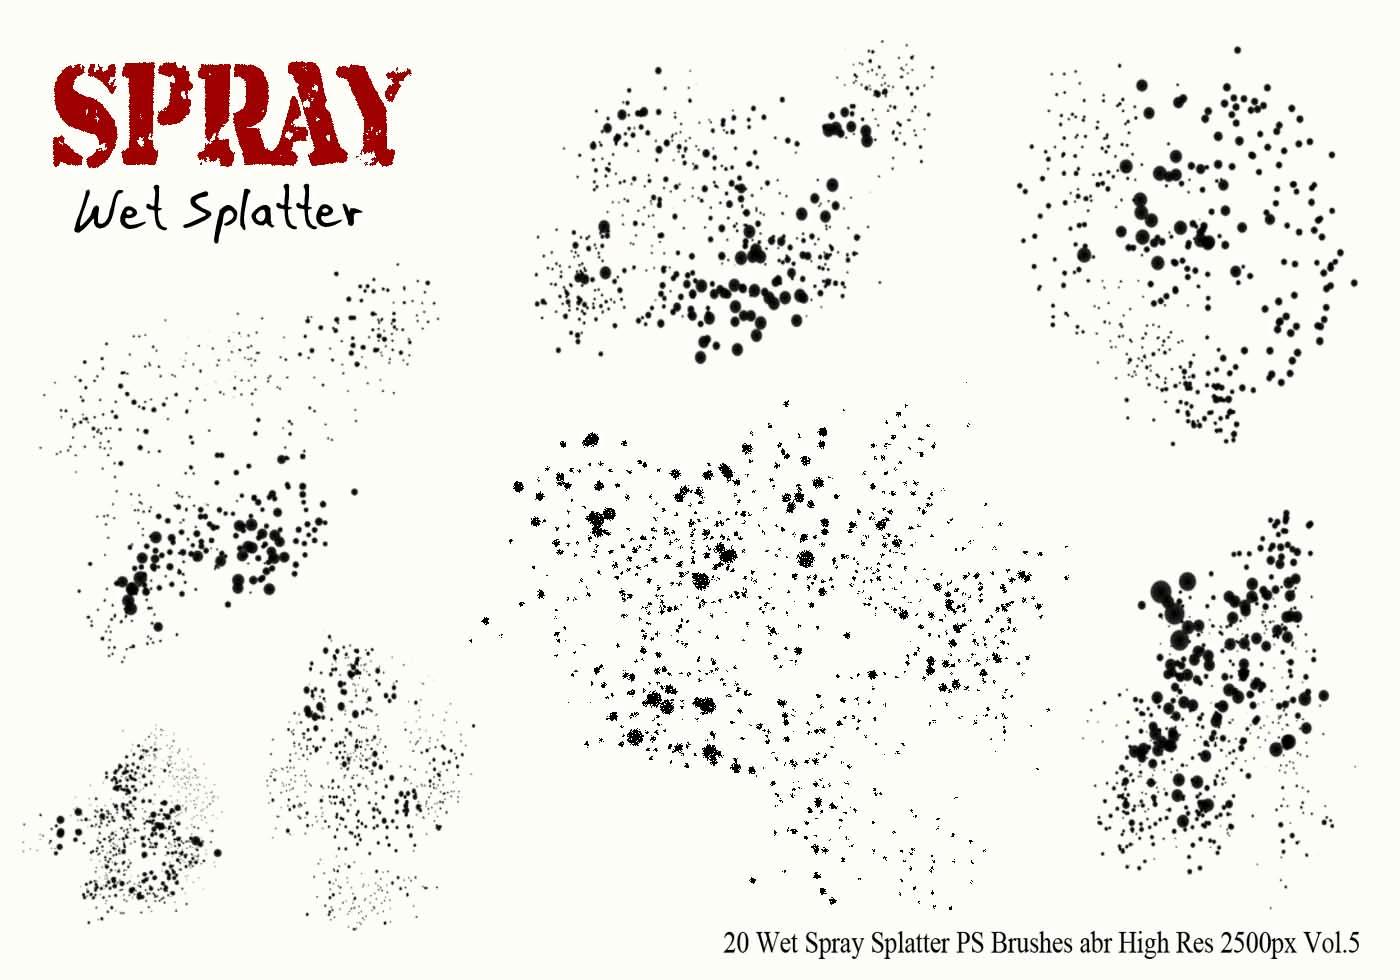 Paint Splatter Brush Photoshop Beautiful 20 Wet Spray Splatter Ps Brushes Vol 5 Free Shop